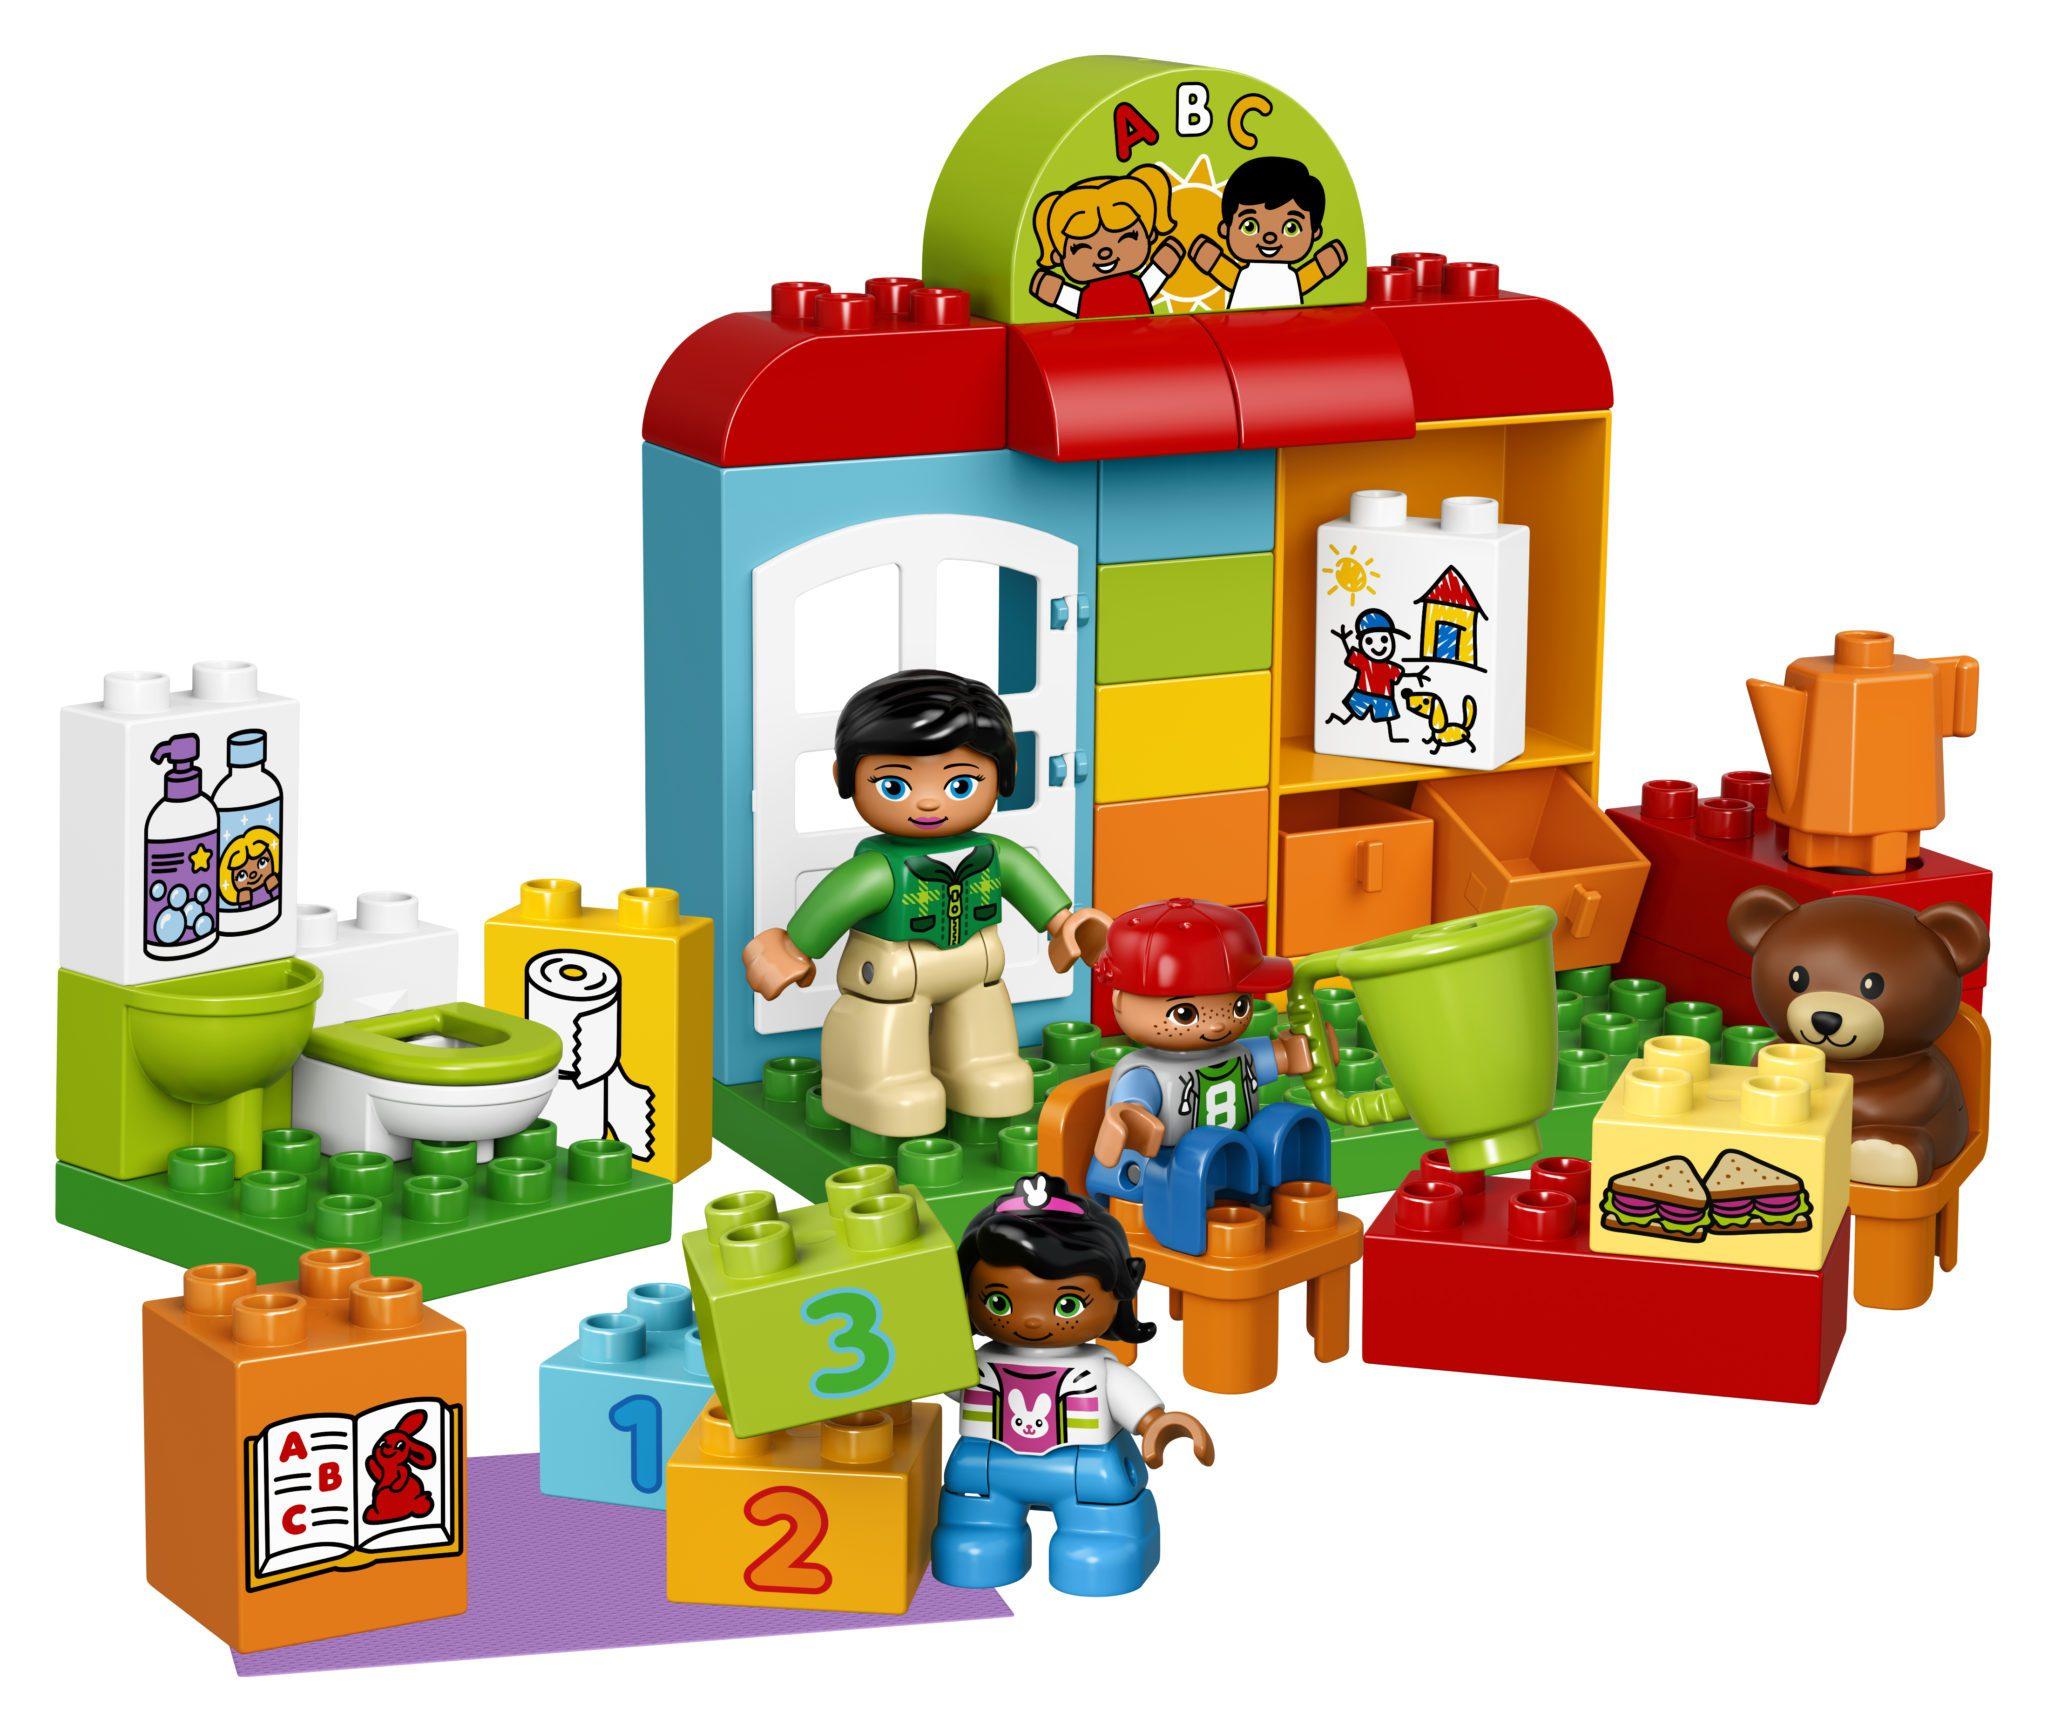 LEGO DUPLO My Town Preschool Set